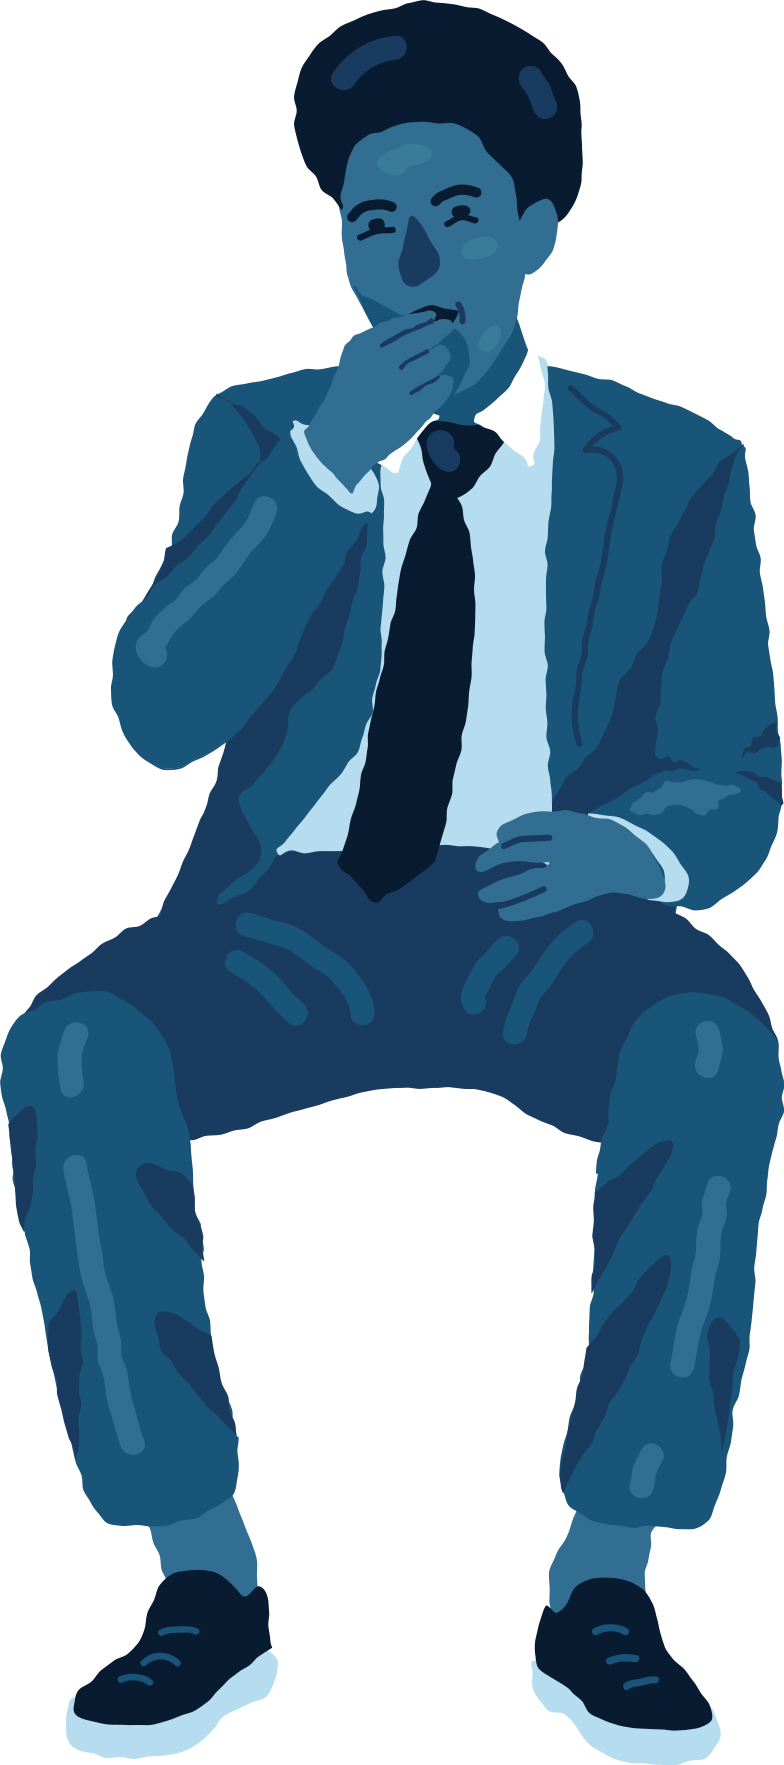 sitting man cinema Clipart illustration in PNG, SVG